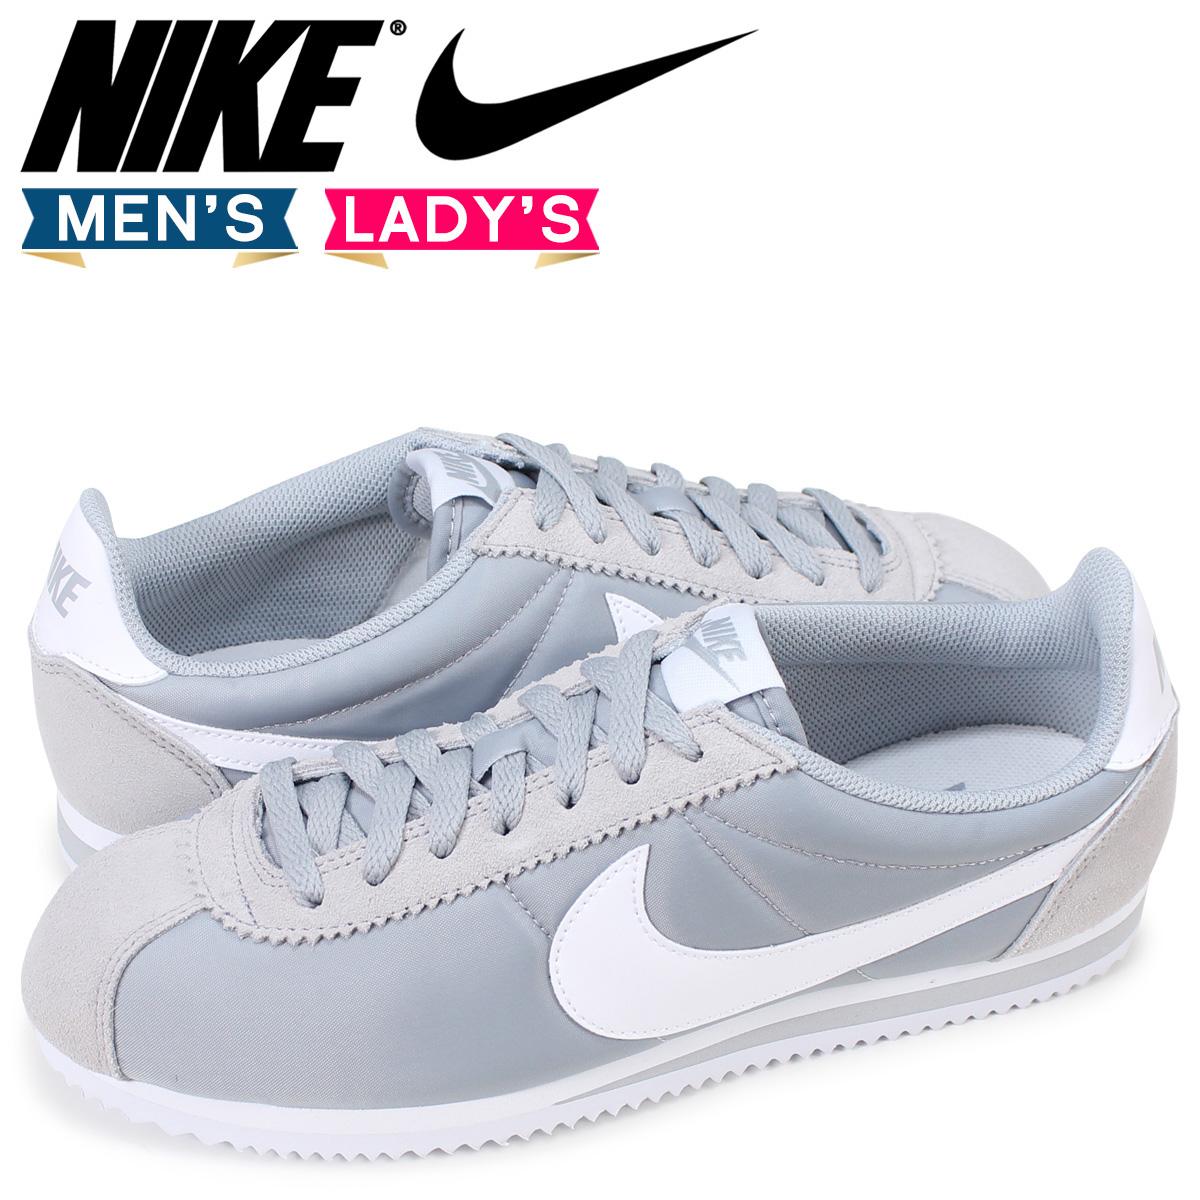 SneaK Online Shop   Rakuten Global Market: Nike NIKE classic Cortez sneaker CLASSIC CORTEZ NYLON 807472-010 Wolf grey men's women's shoes grey